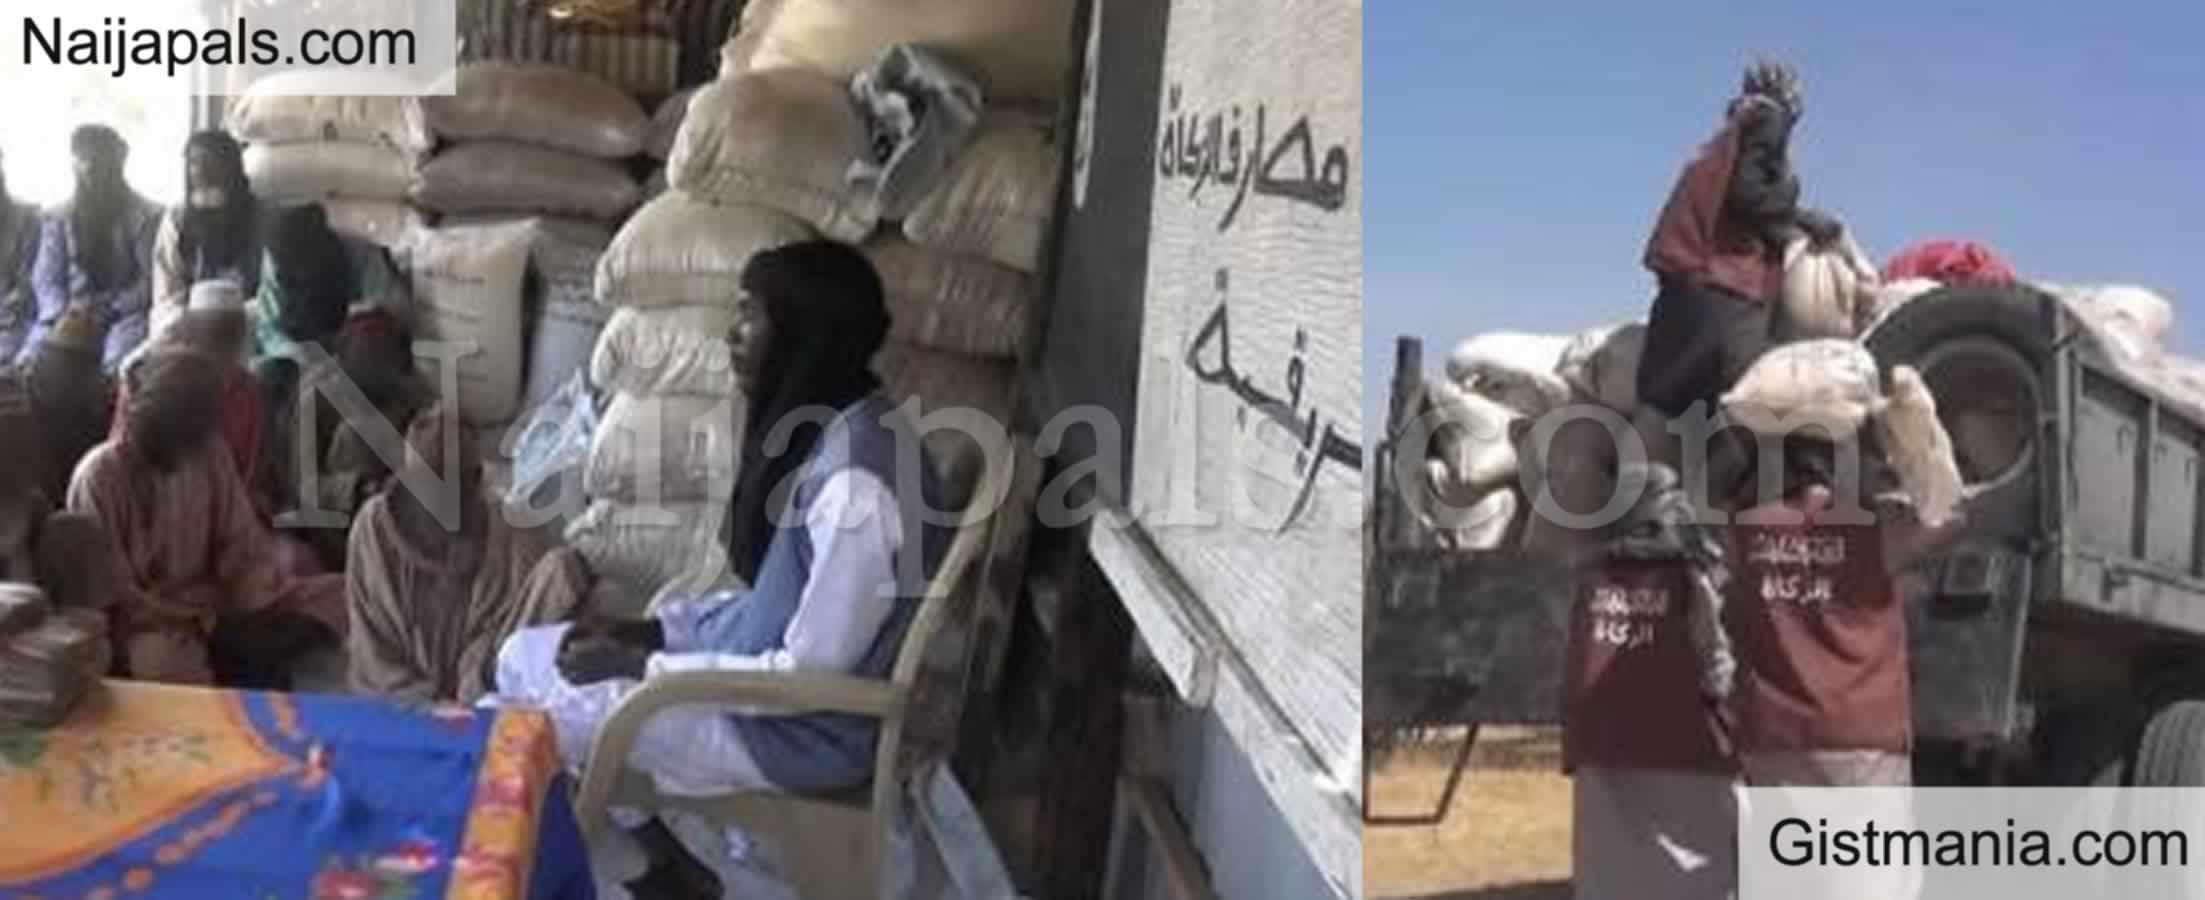 <img alt='.' class='lazyload' data-src='https://img.gistmania.com/emot/news.gif' /> <b>Boko Haram Distributes Ramadan Packages, Cash To Borno, Yobe Residents</b> (PHOTOS)